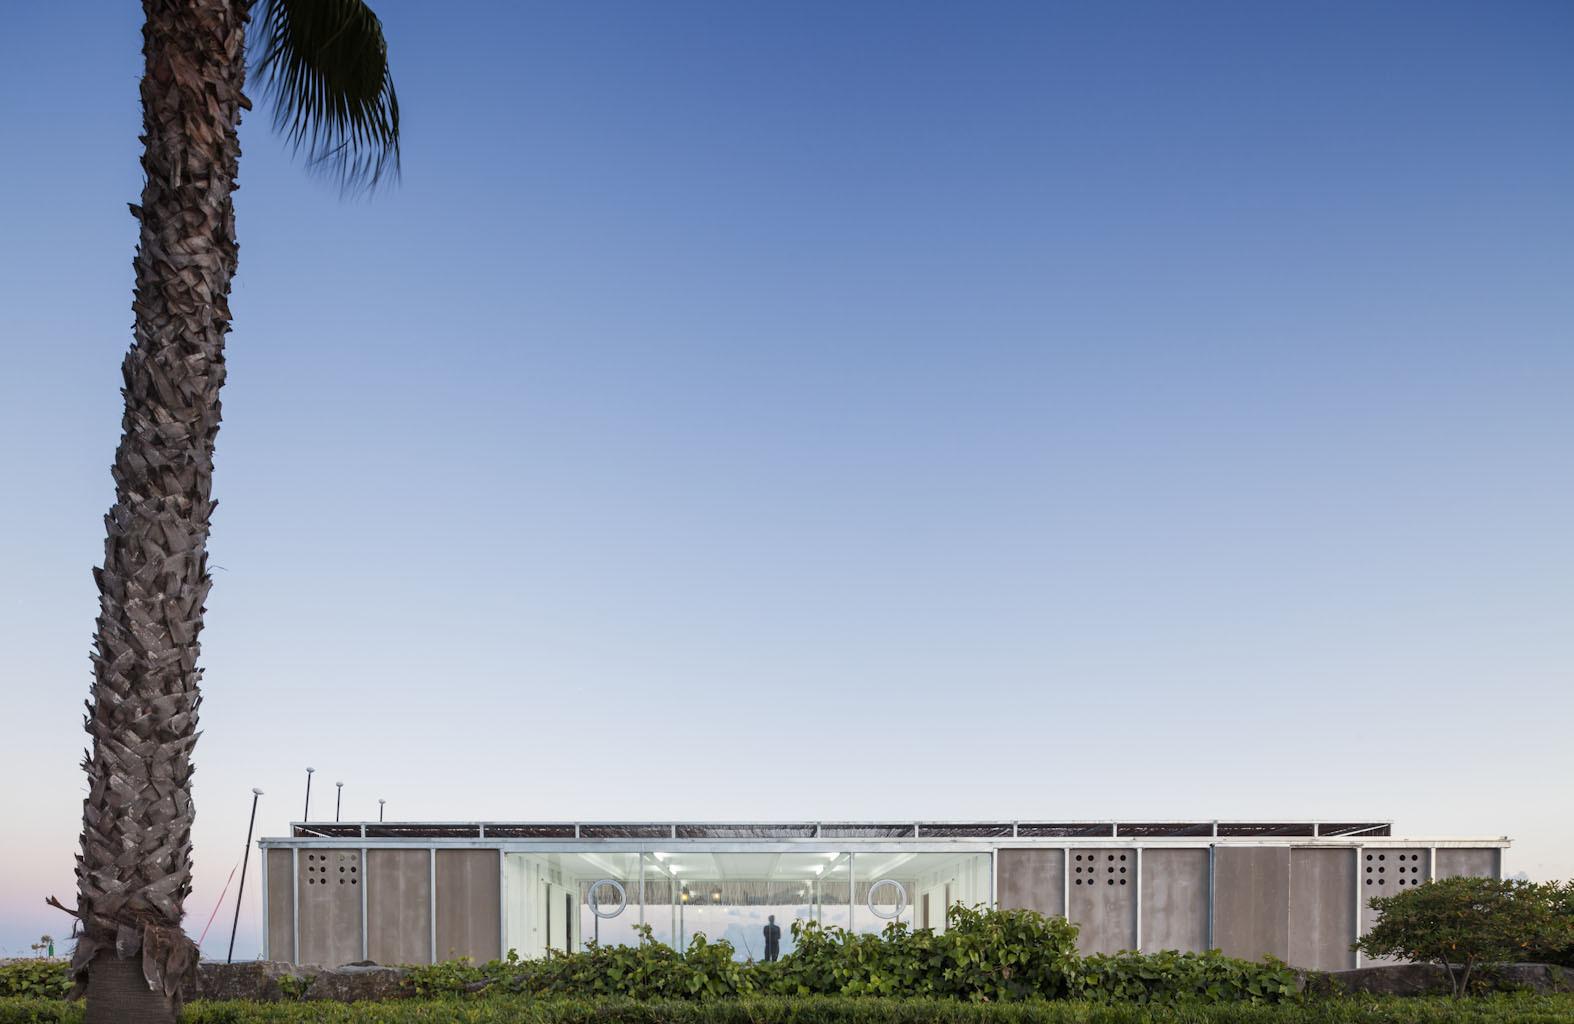 Escuela de Vela de Sotogrande en Cádiz. Héctor Fernández Elorza/HFE Arch + Carlos García Fernández . Image © Montse Zamorano